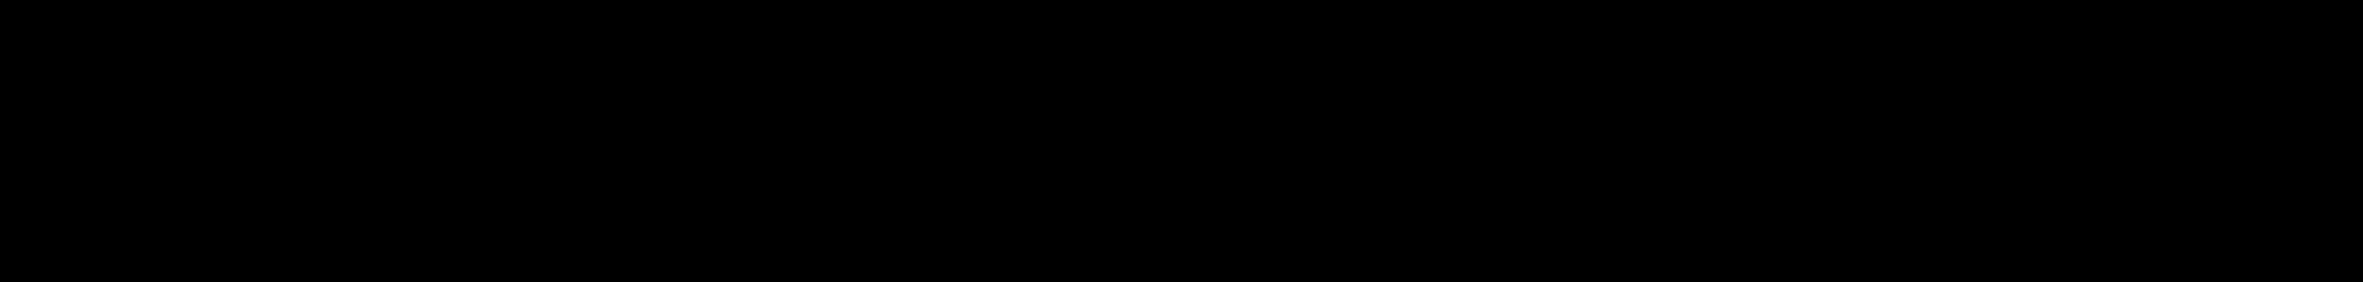 CaseCracker